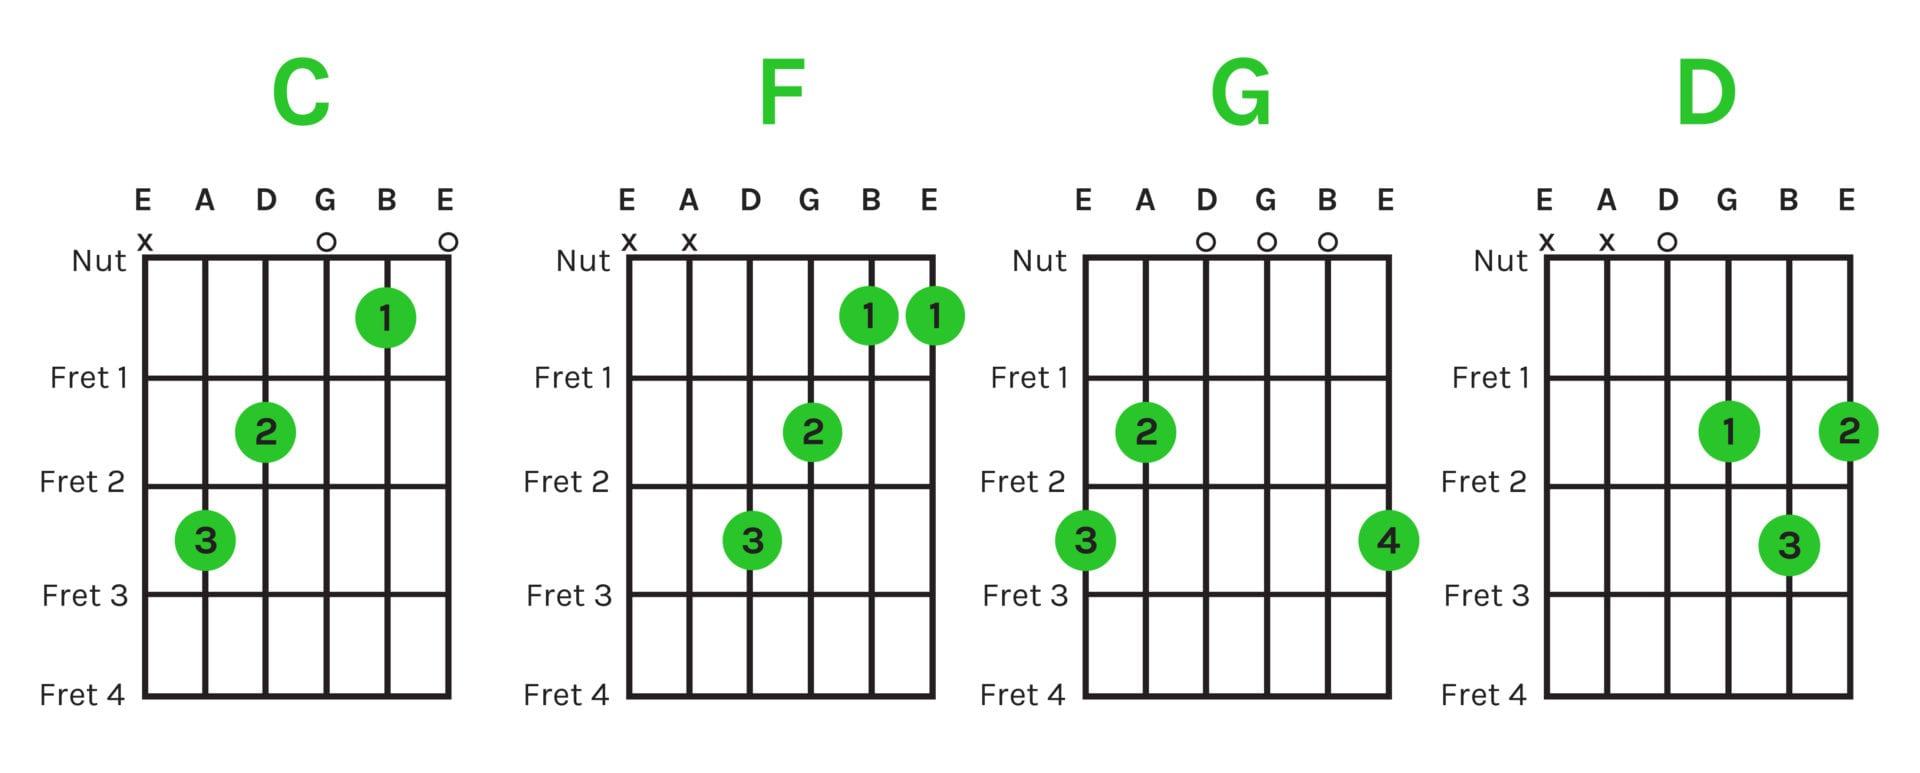 1 145 Progressions Chord Chart Beginning